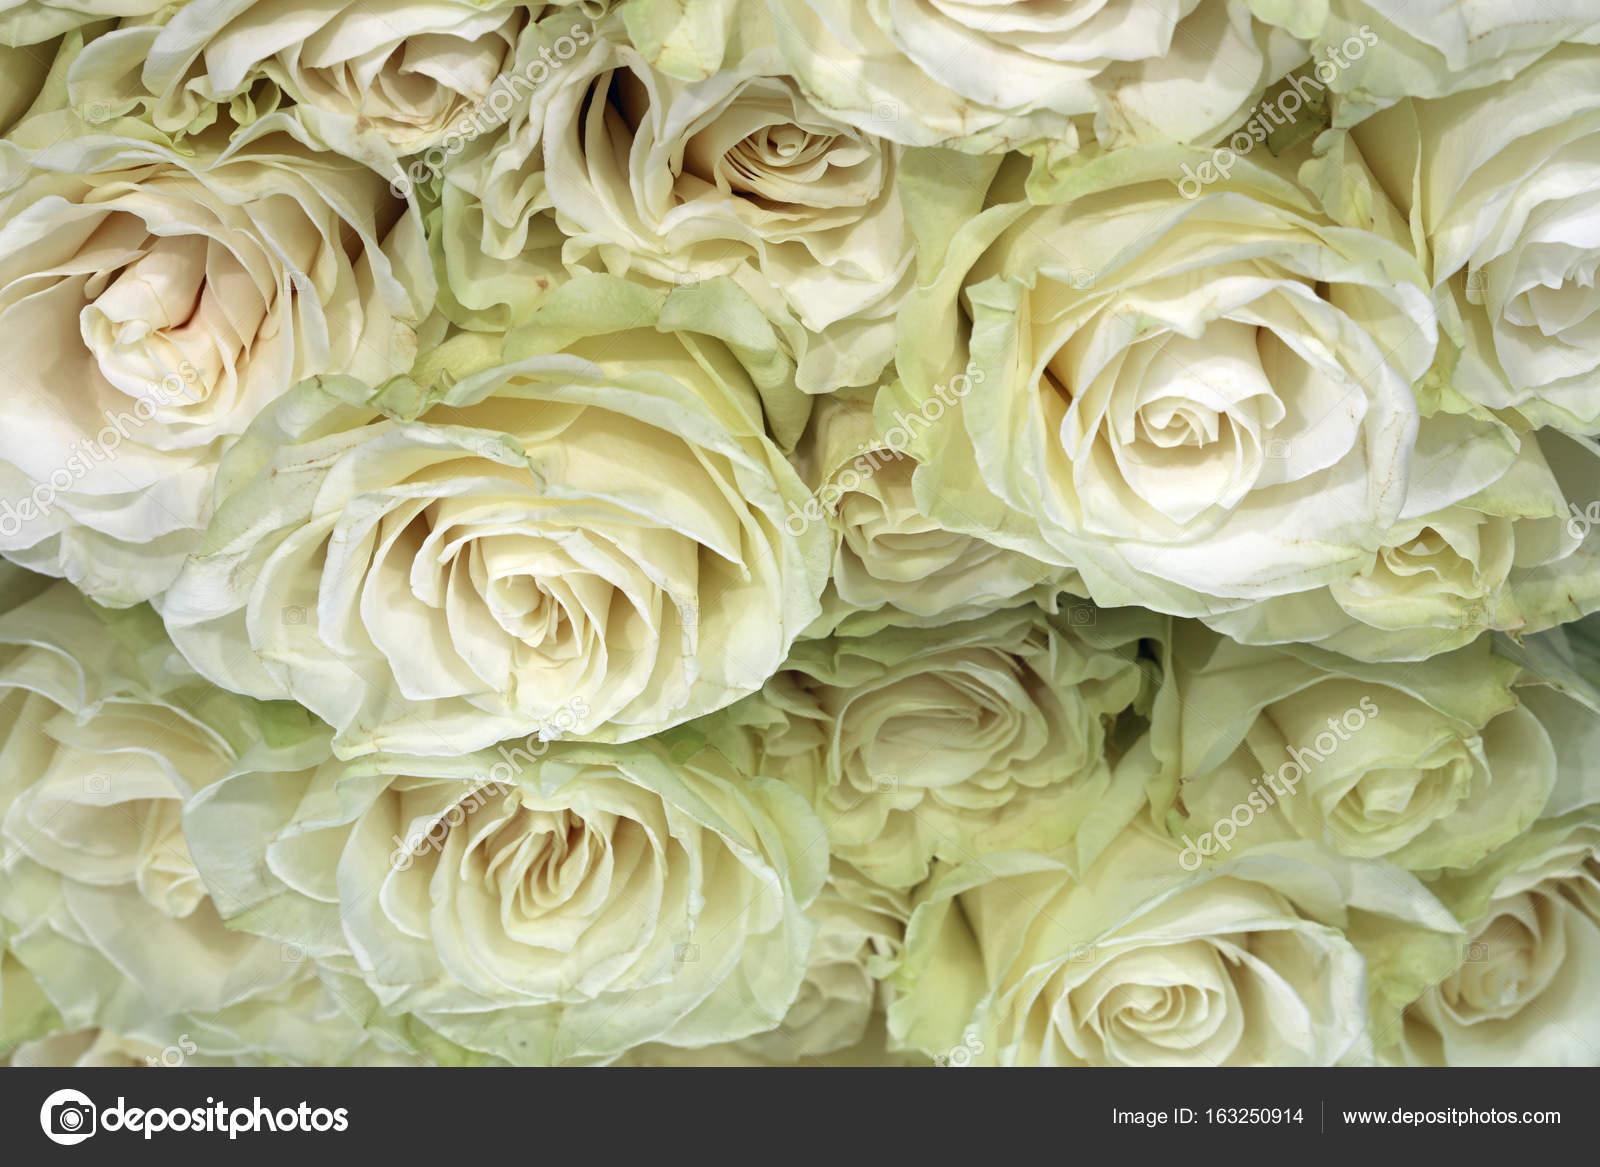 Bunch Of White Roses Stock Photo Benri185 163250914